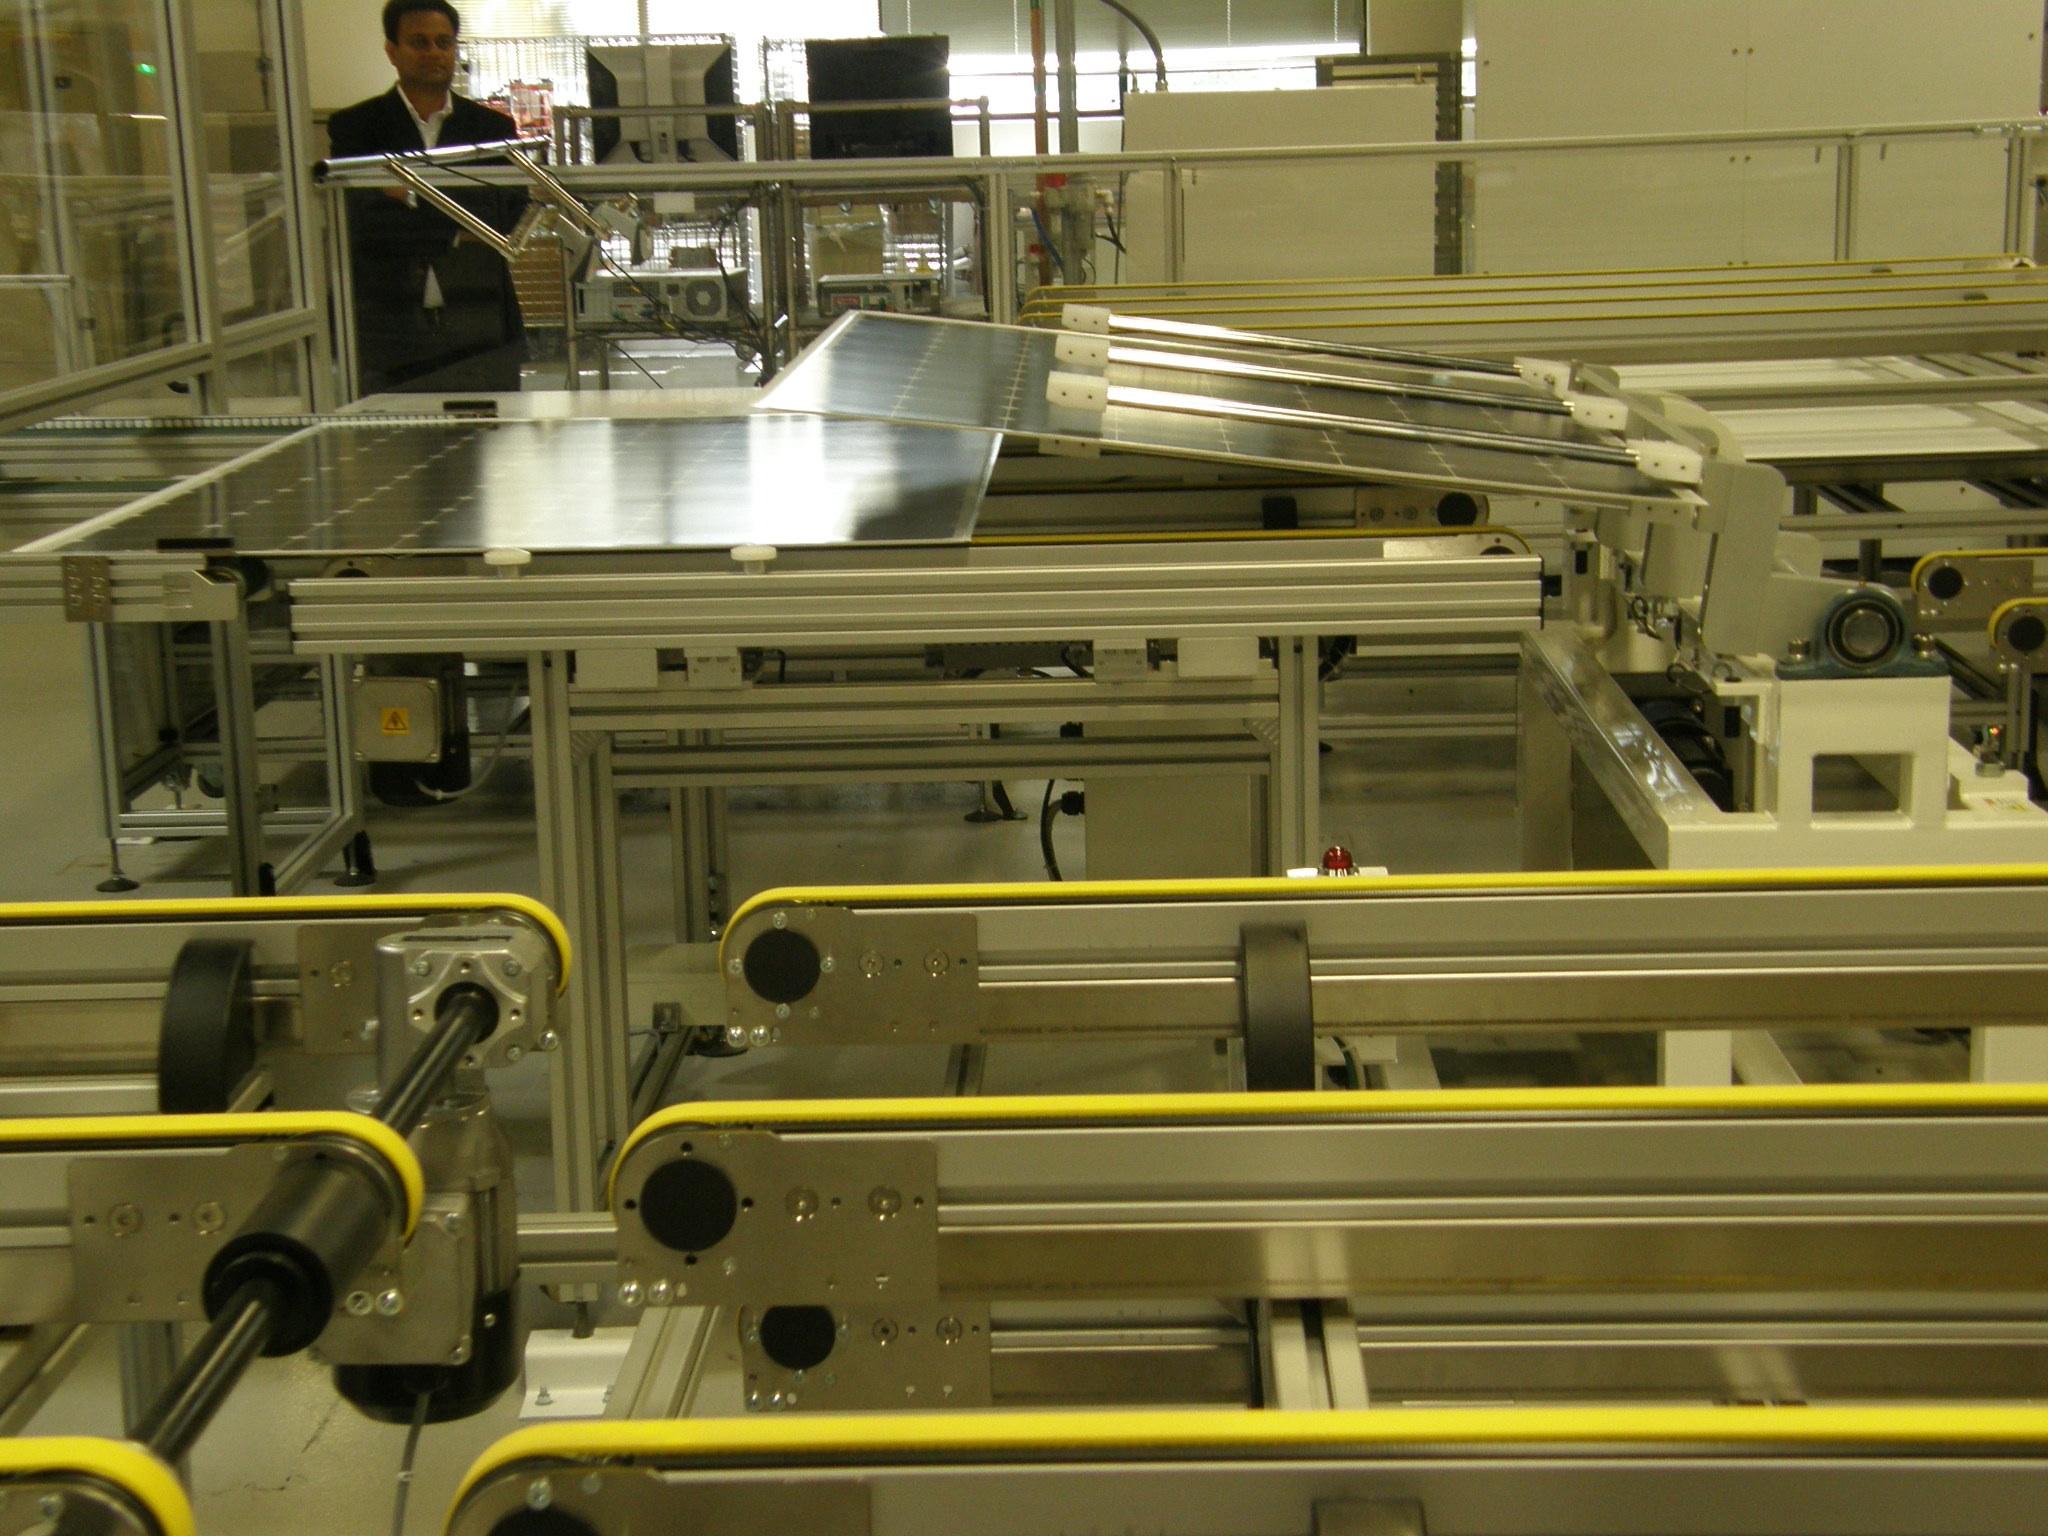 SunPower & Flextronics factory in Milpitas, CA